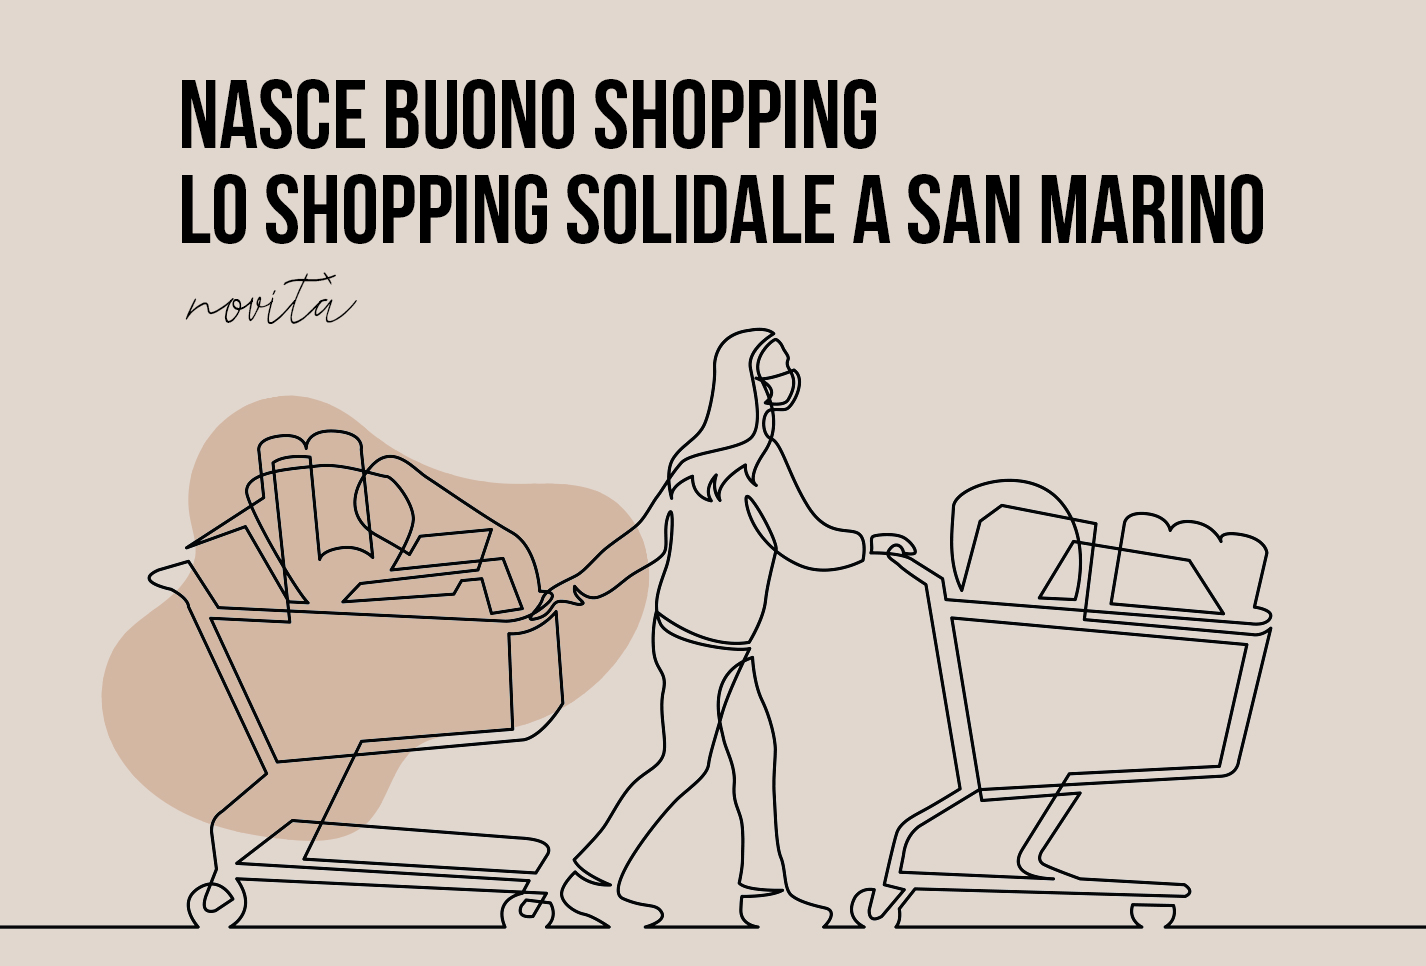 Lo shopping solidale a San Marino